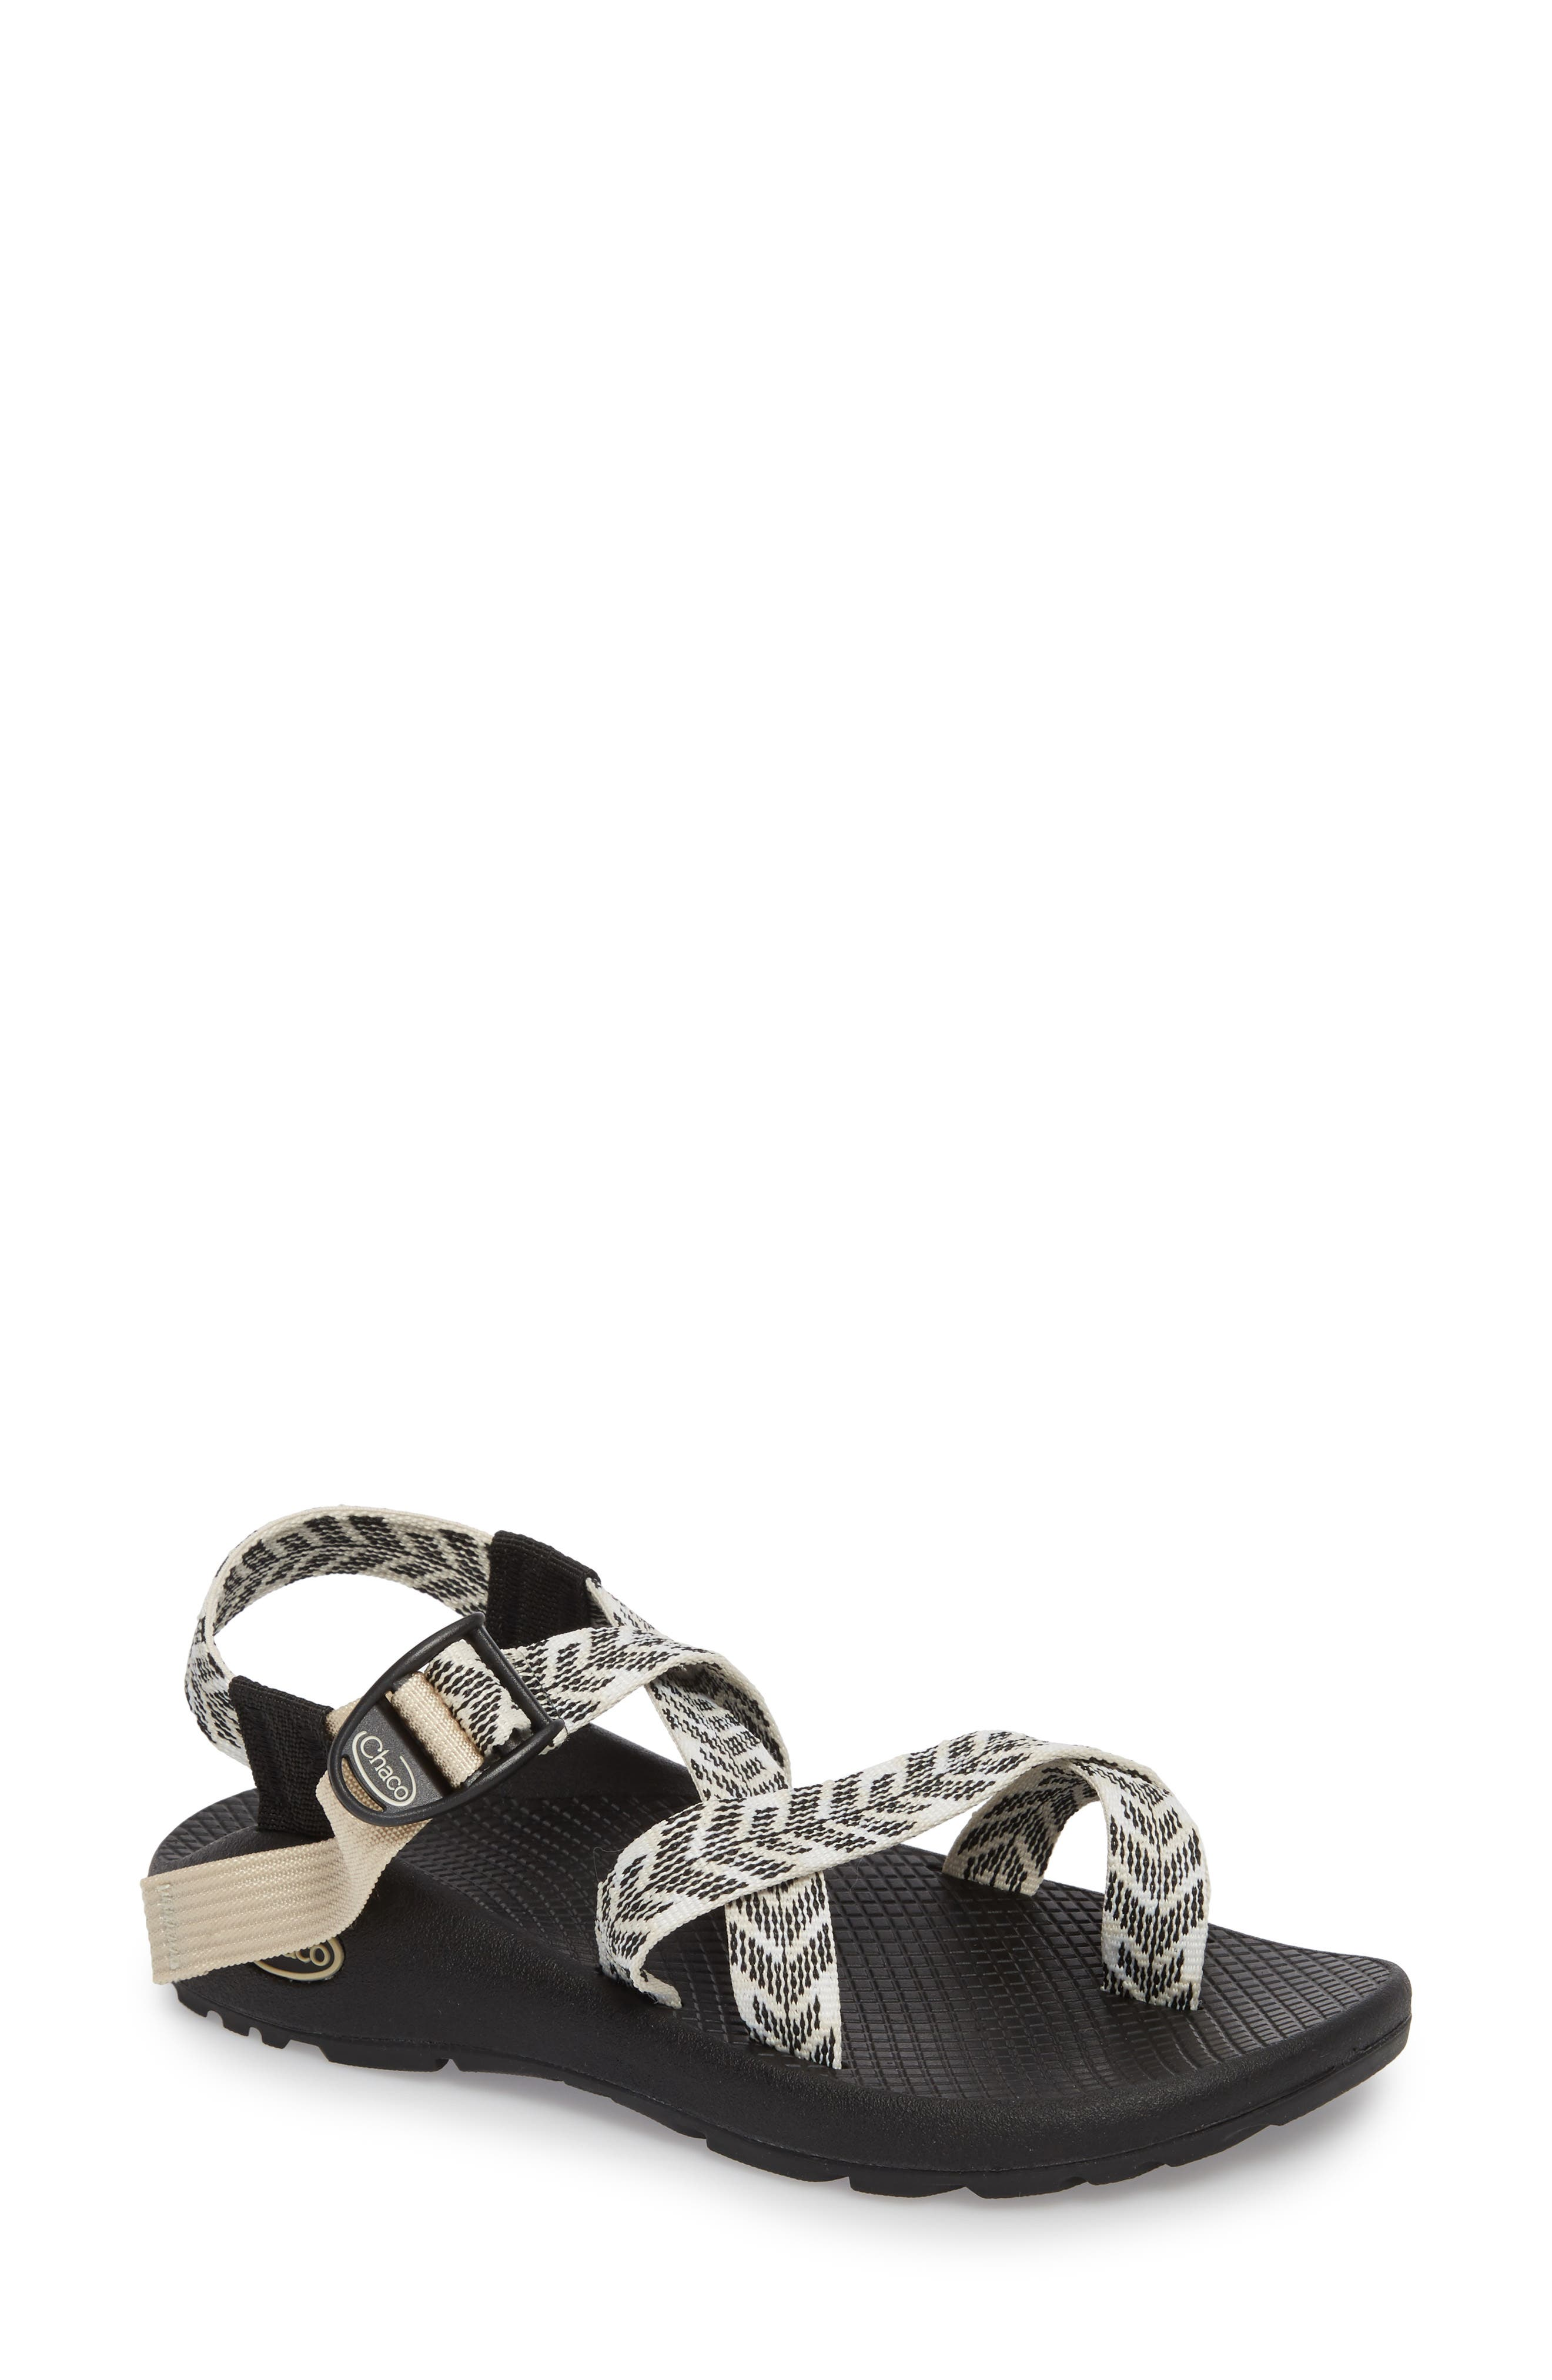 Z/2 Classic Sport Sandal,                             Main thumbnail 1, color,                             TRINE BLACK / WHITE